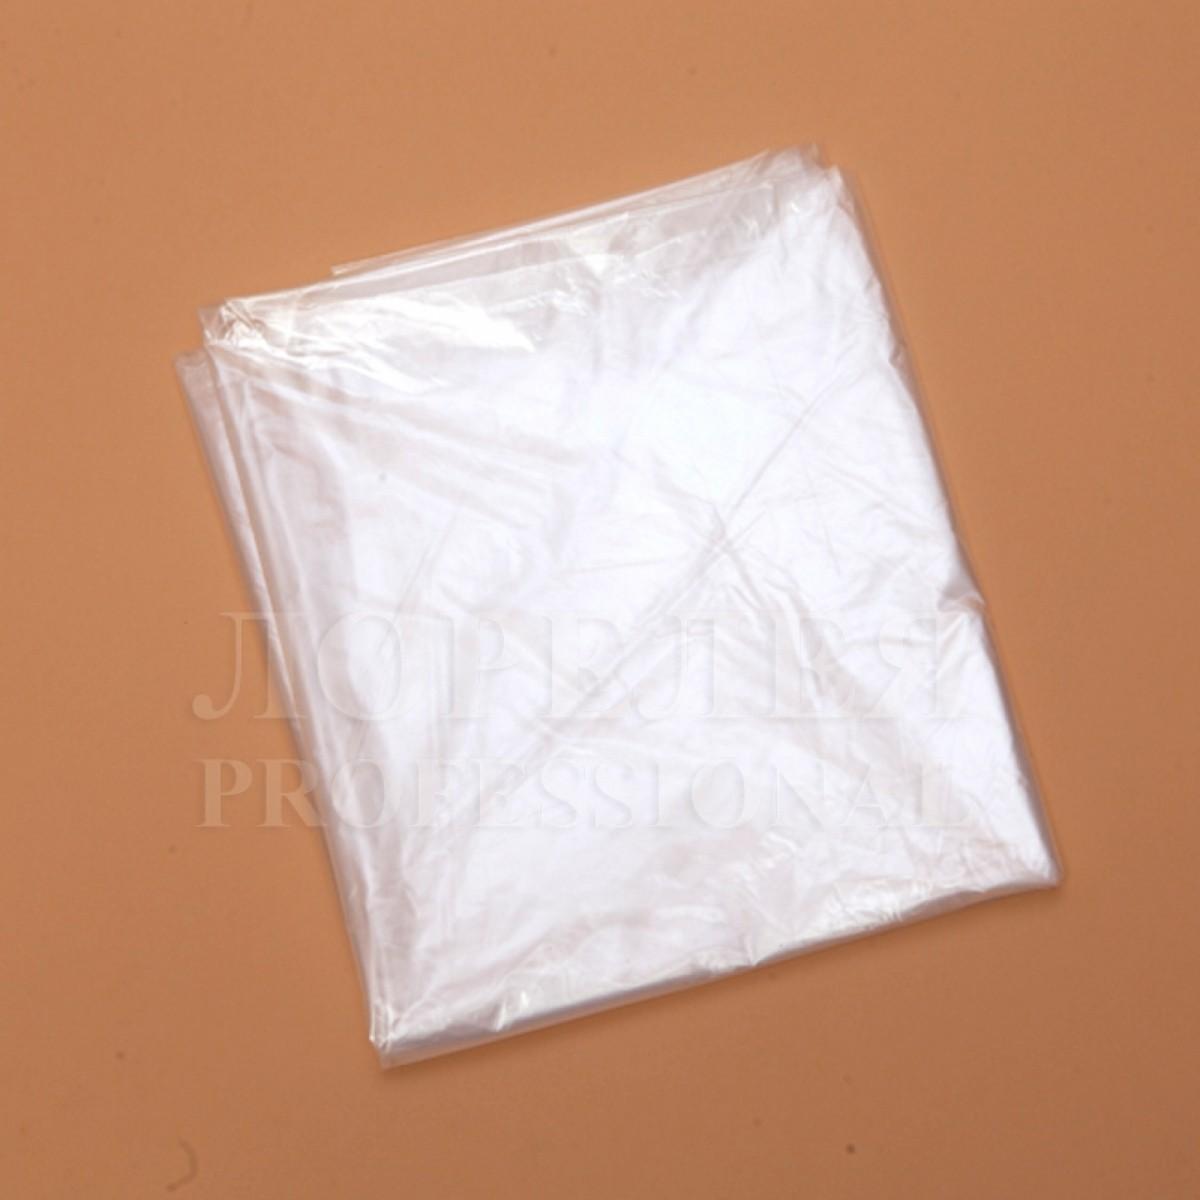 Простыни п/э прозрачная (уп. 20 шт.)